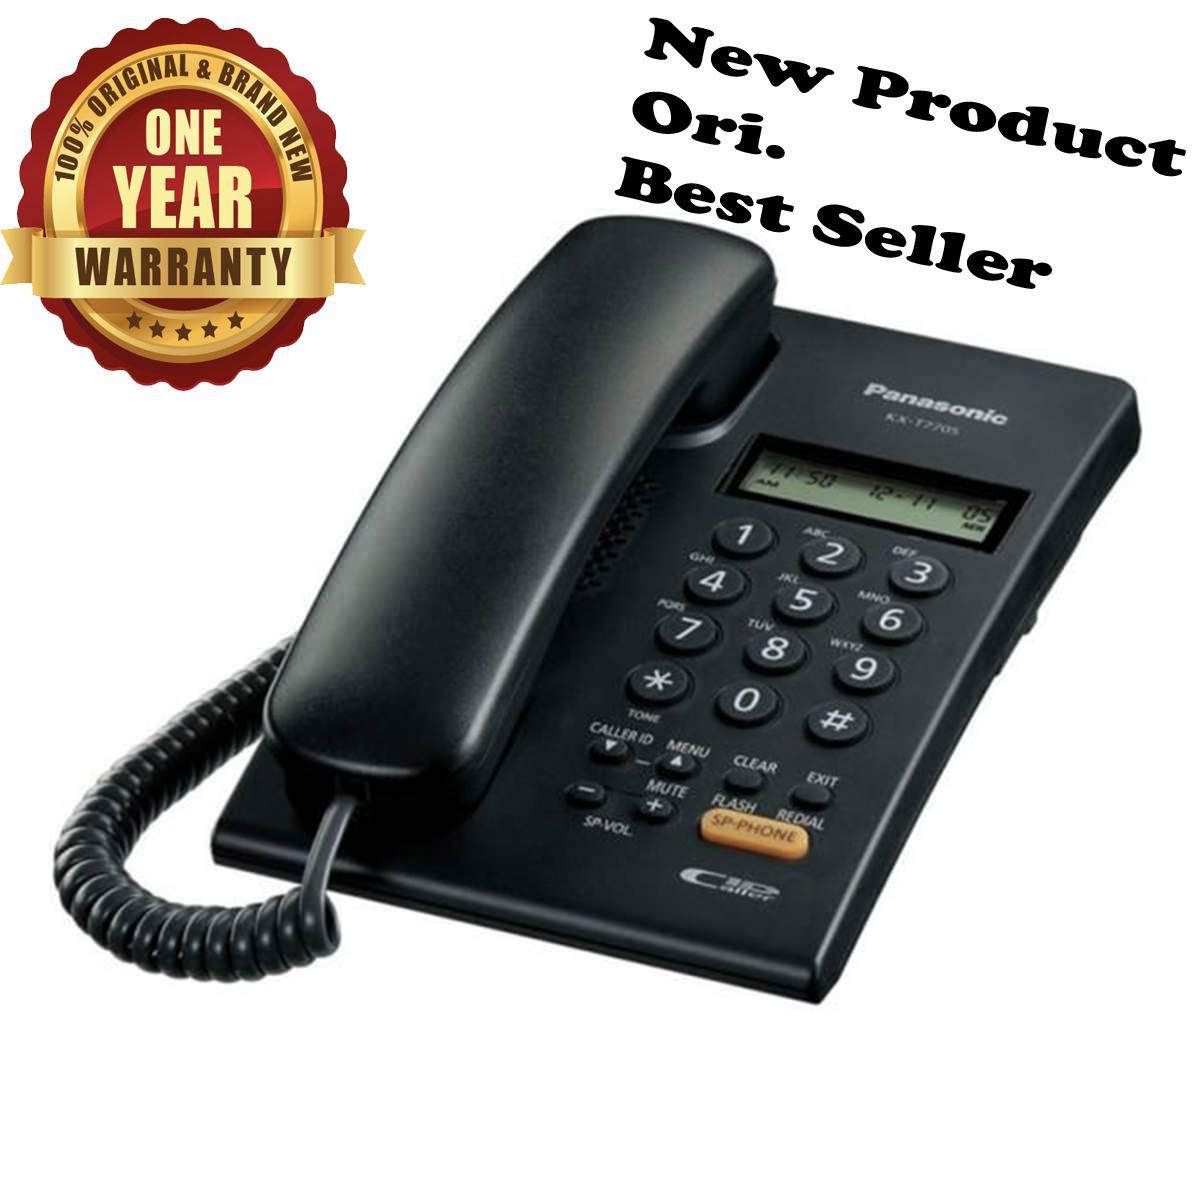 Panasonic Best Seller Murah KX-T7705 / T-7705 / T 7705 Telepon Kabel Rumah Kantor Hotel Telephone Single Line Bergaransi Resmi - Hitam